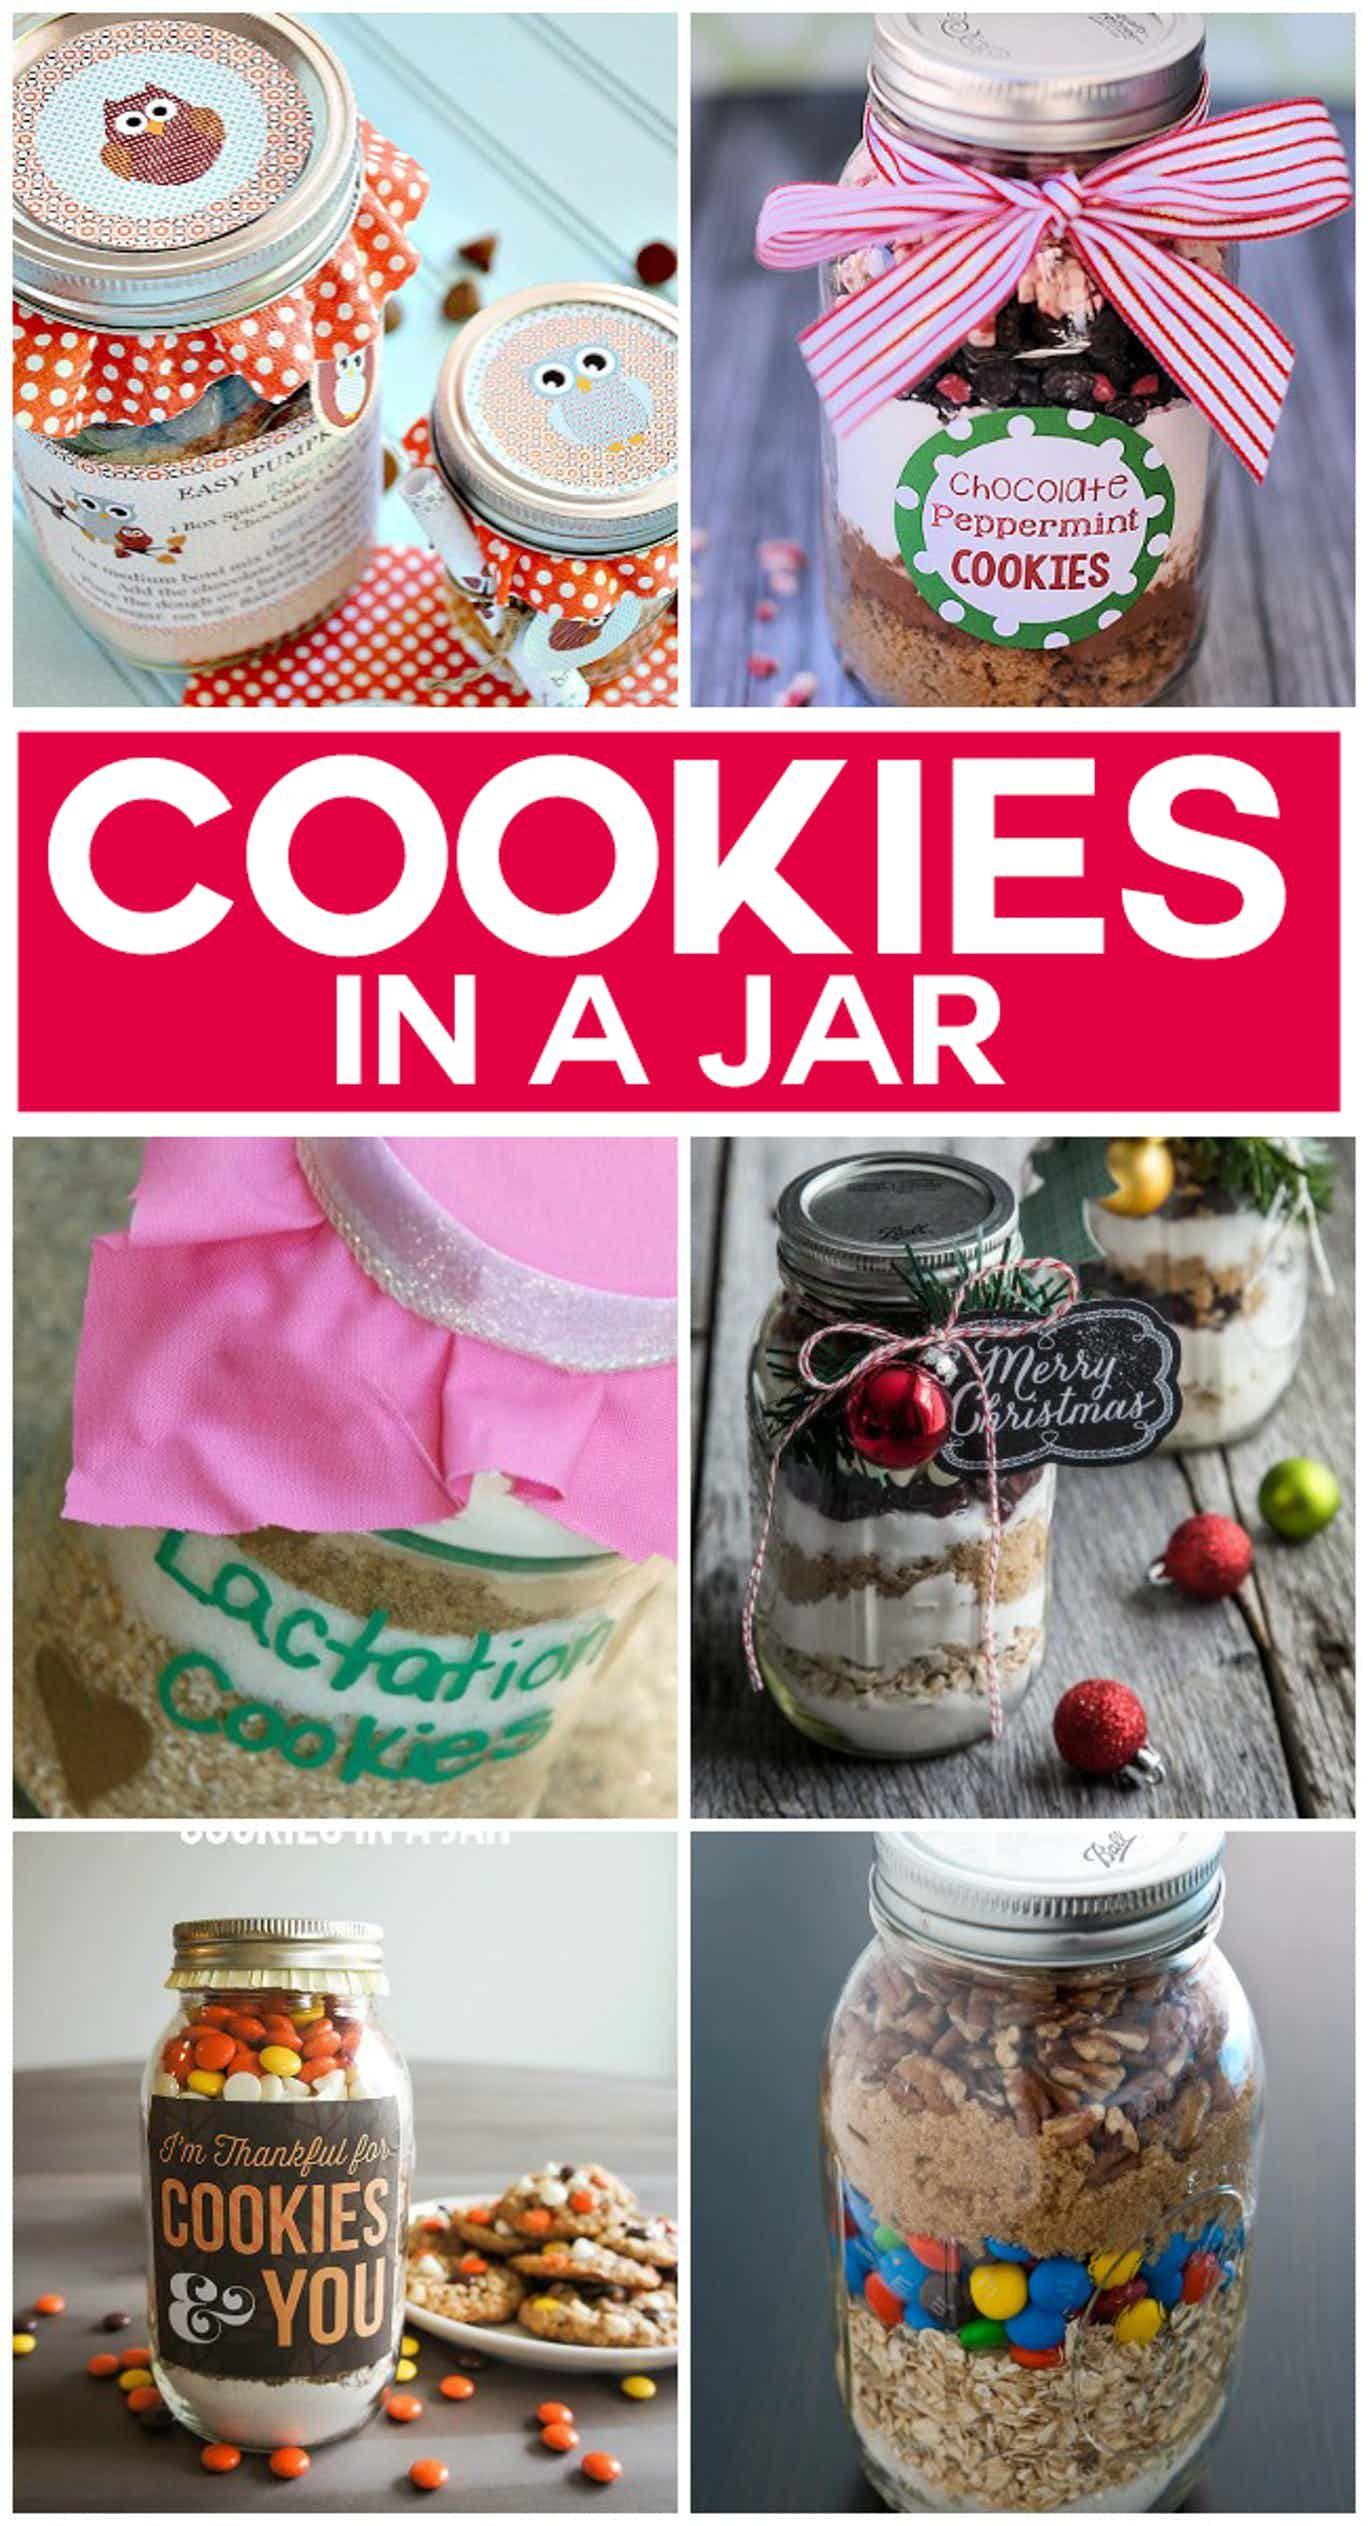 20 Yummy Cookies In A Jar Kids Activities Mason Jar Cookies Mix Mason Jar Cookies Mason Jar Meals